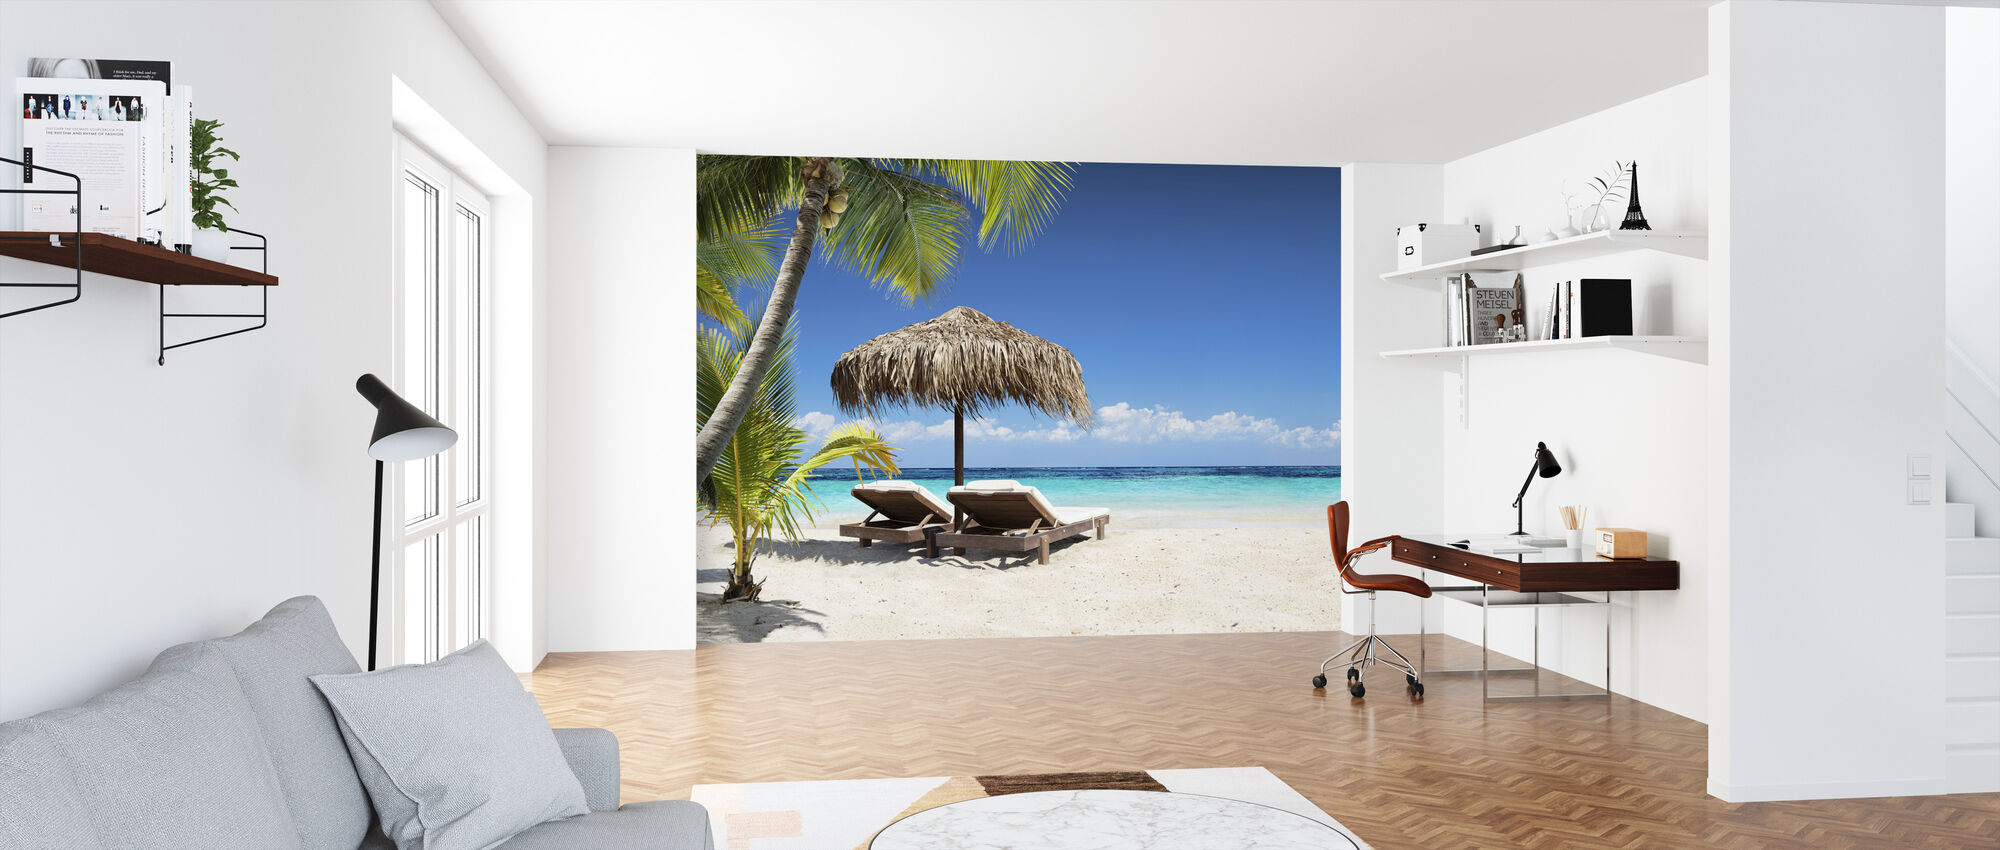 Coral Beach - Tapet - Kontor